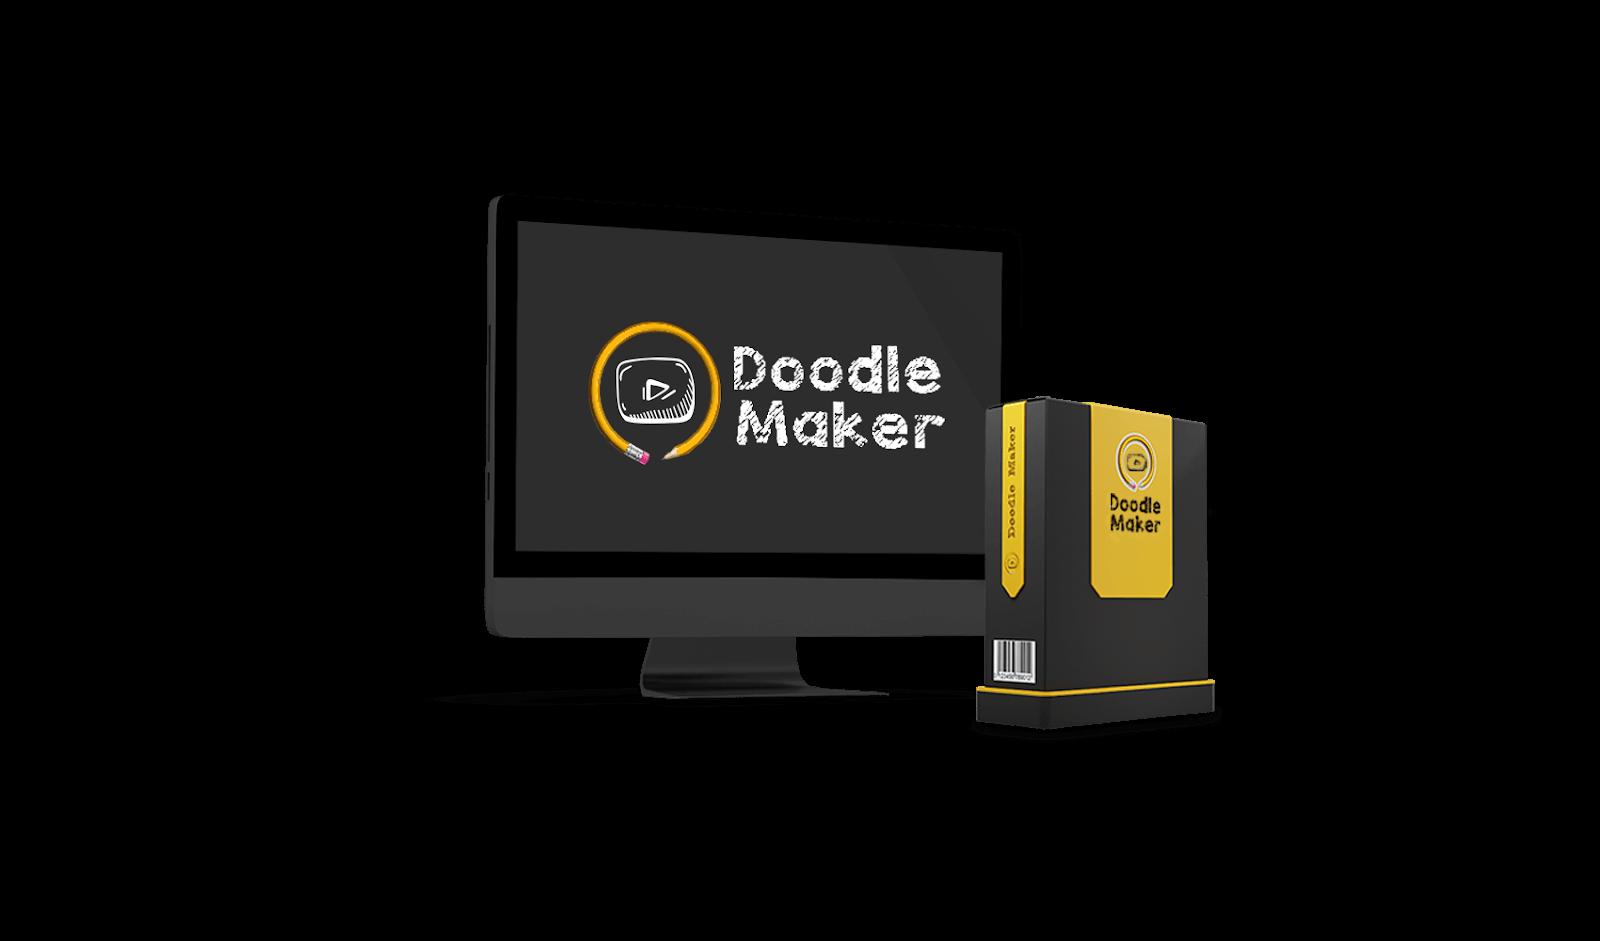 DoodleMaker-Review